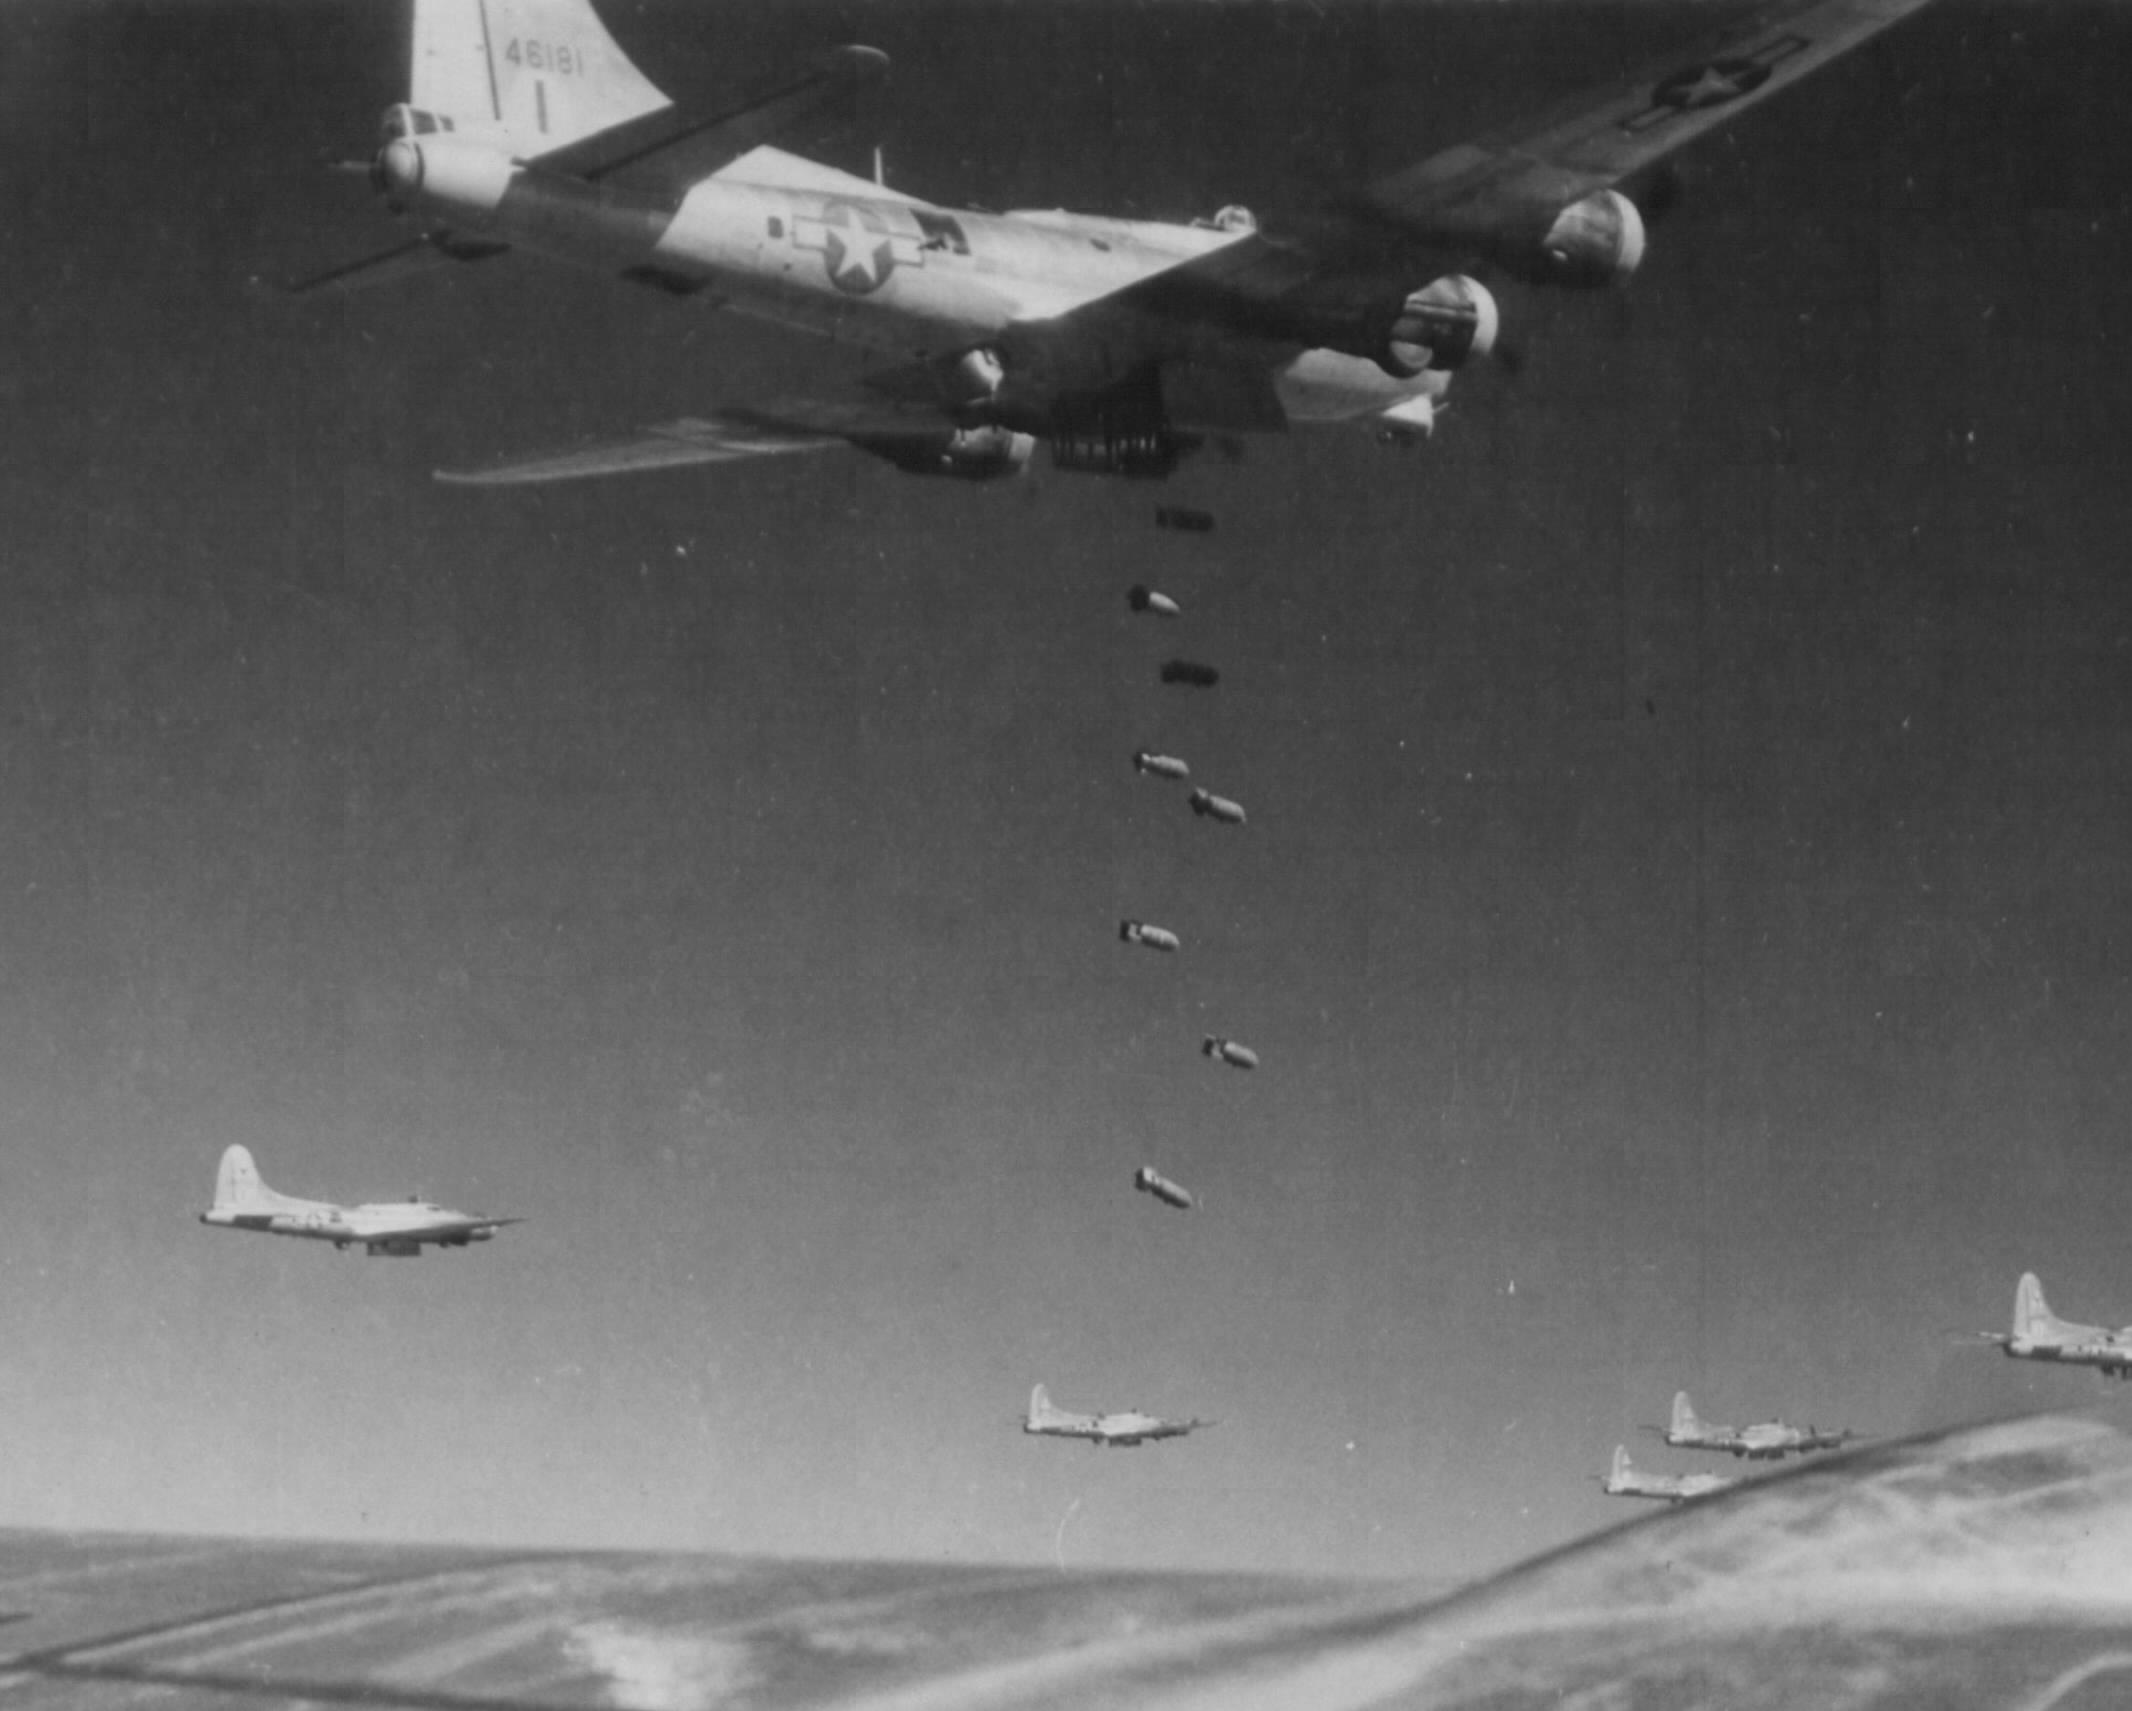 B-17 #44-6181